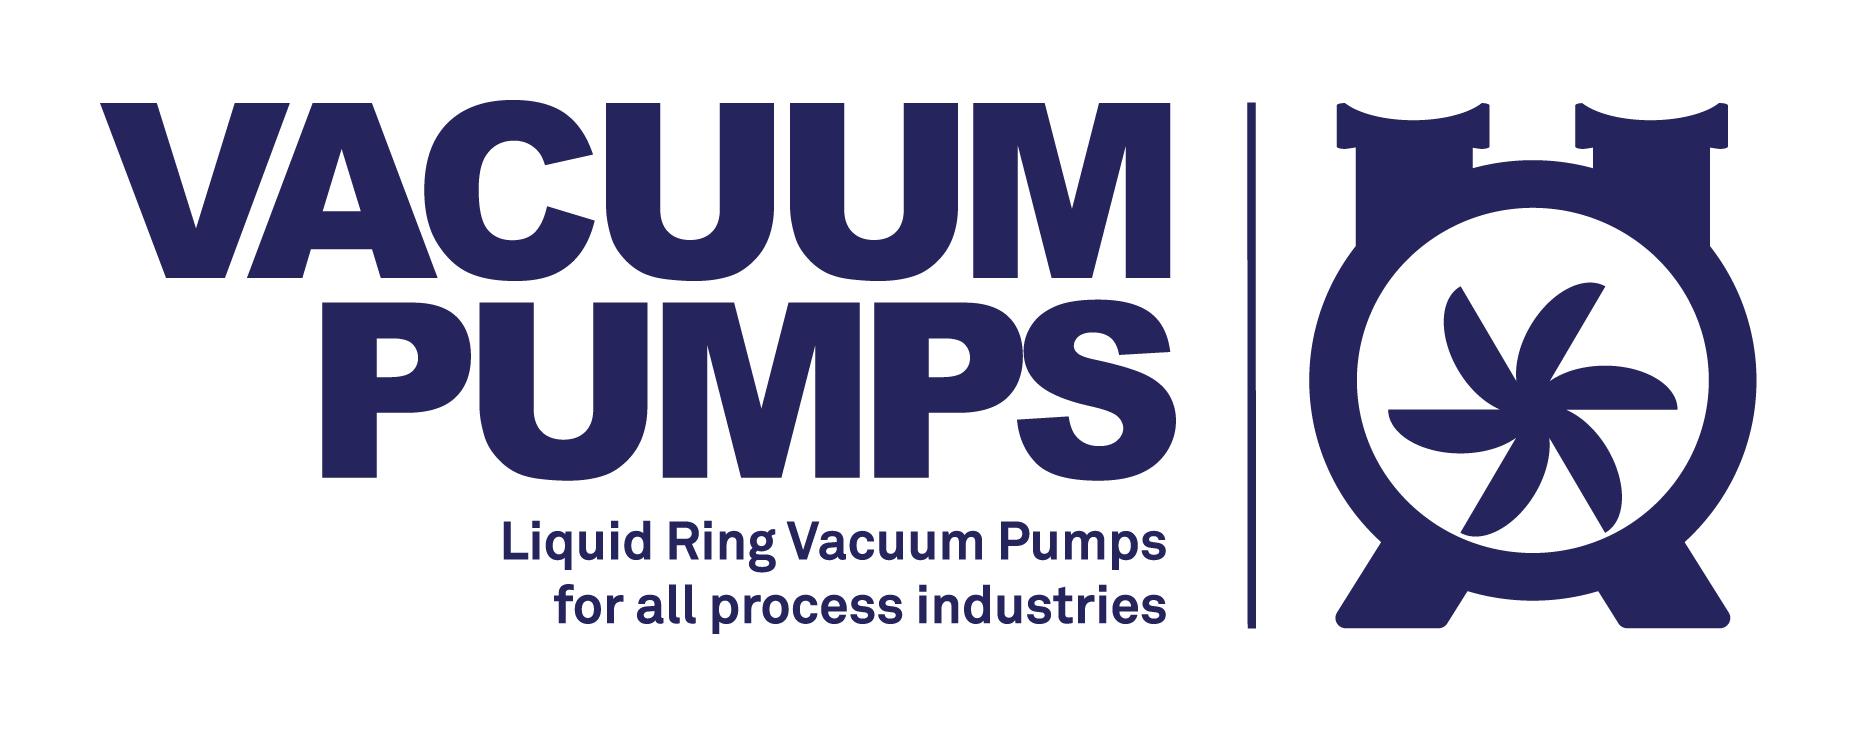 Vacuum Pumps logo